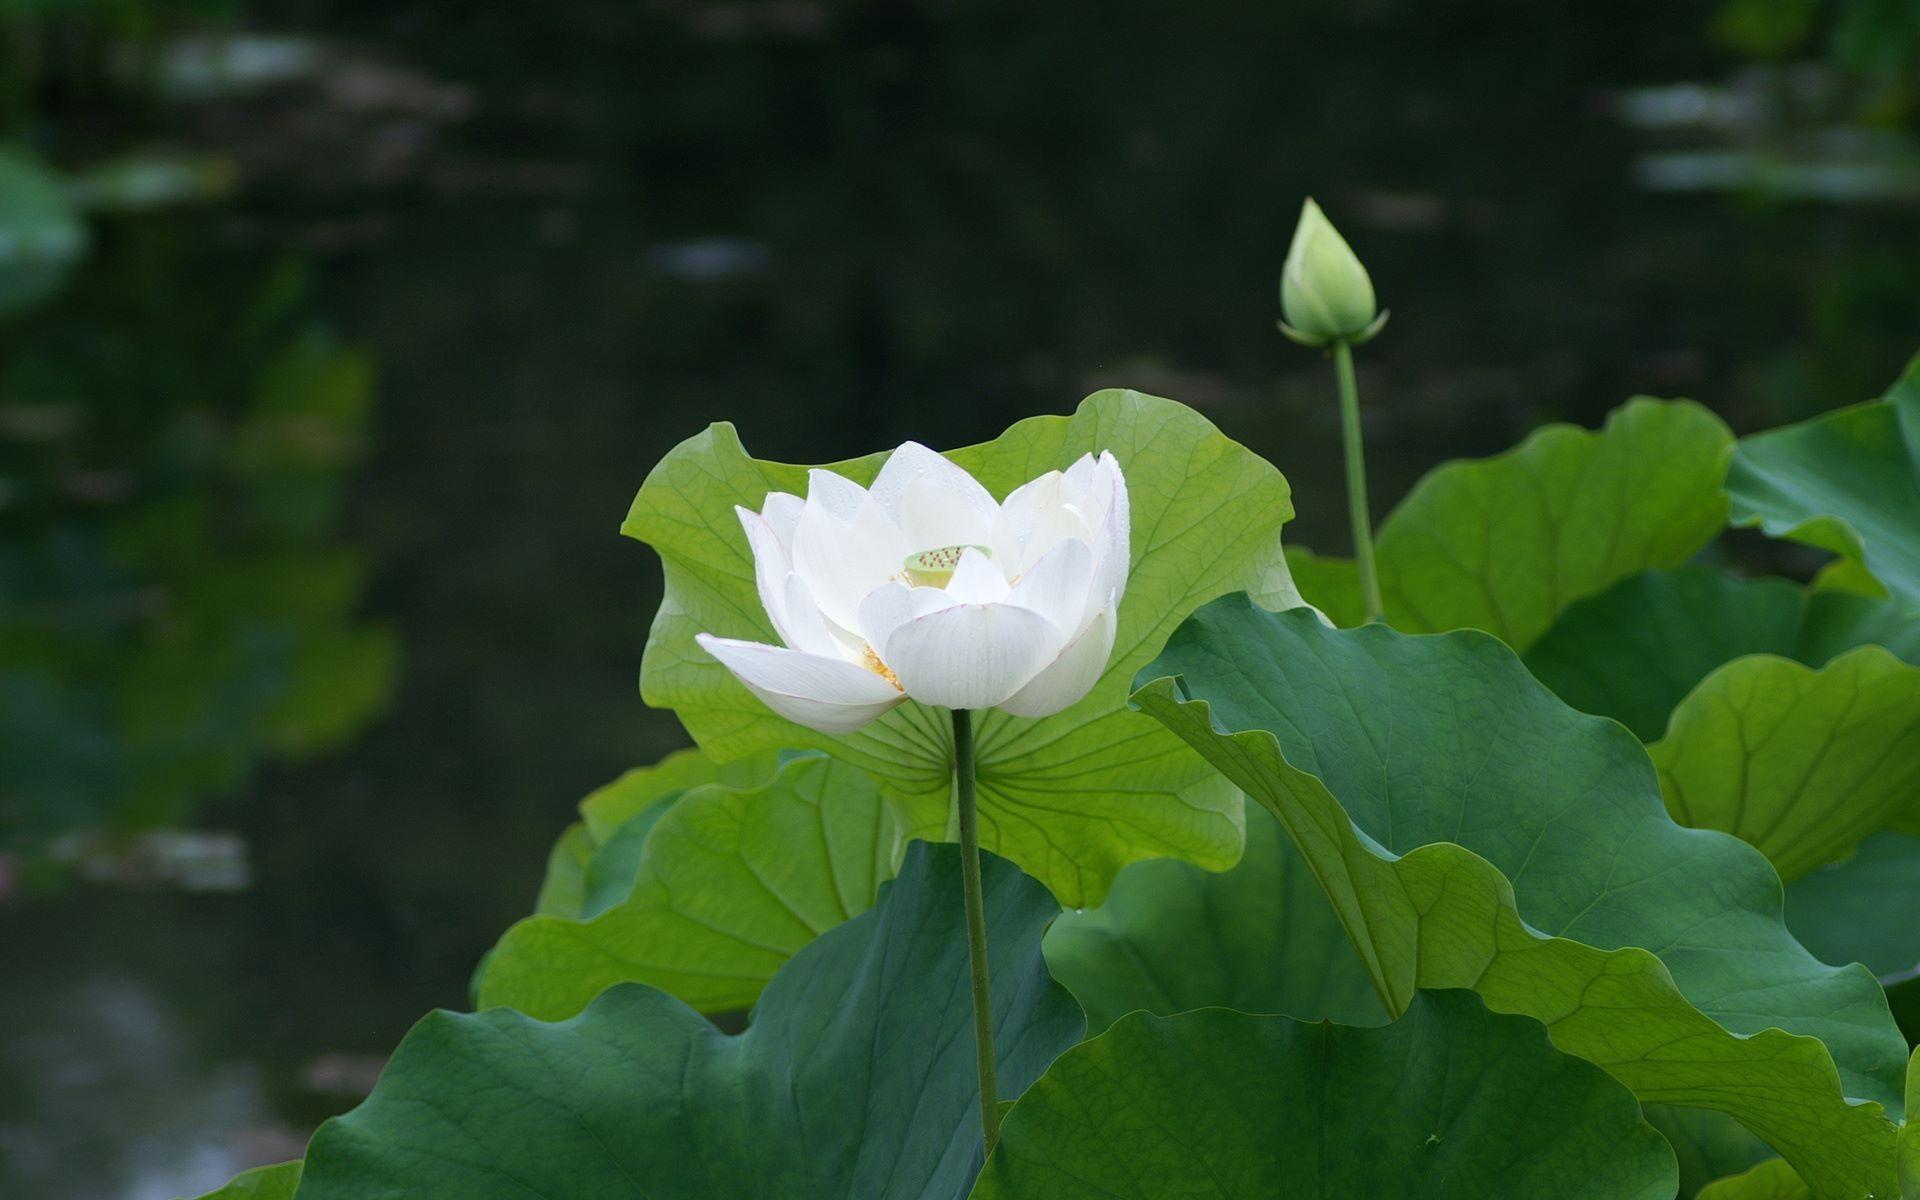 Pin by ed pascua on photography pinterest photography white lotus flower meaning and symbolism mythologian izmirmasajfo